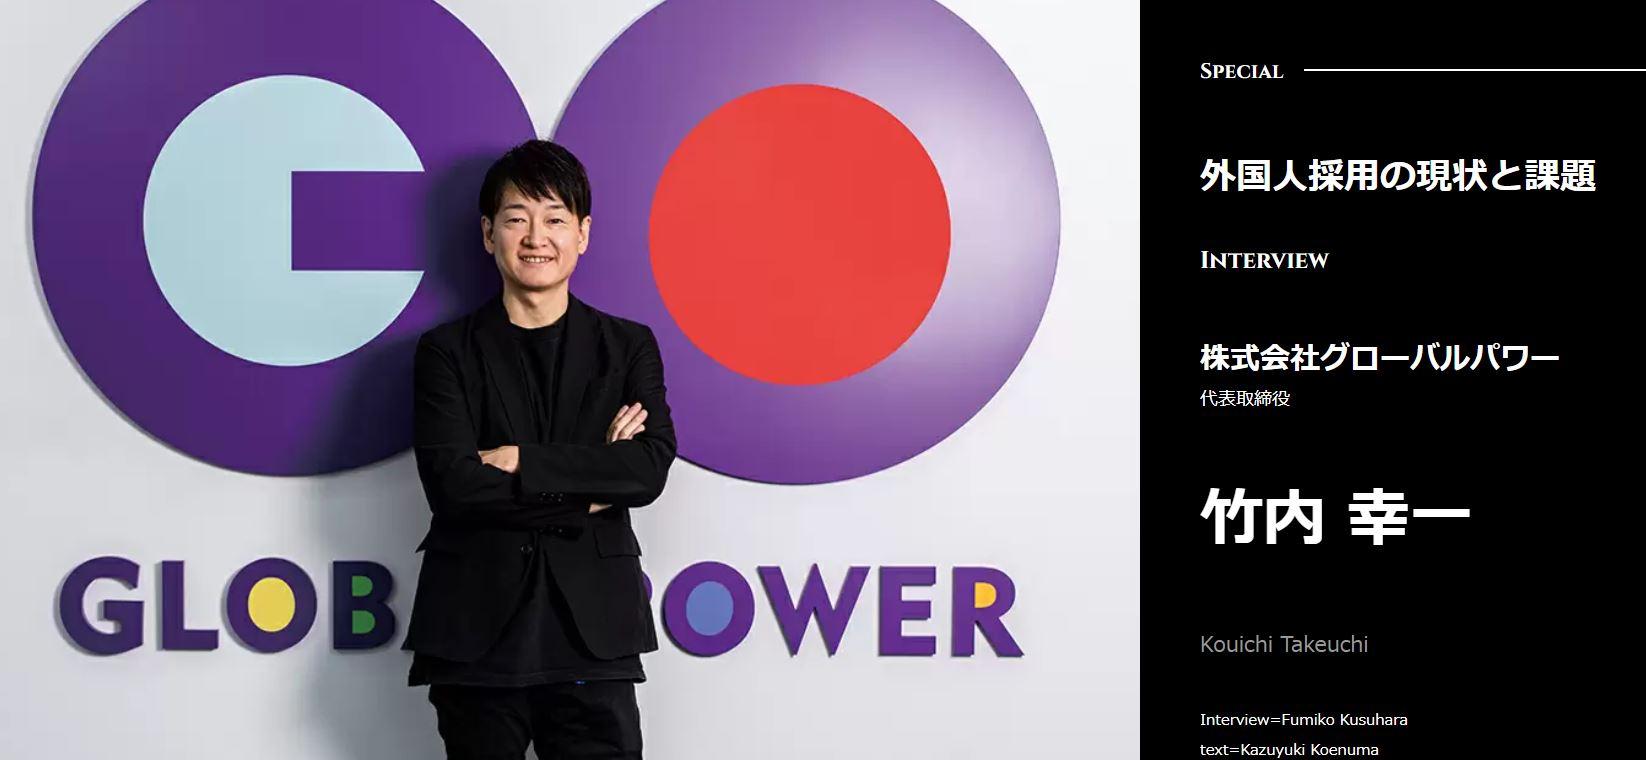 PORTERS MAGAZINE WEBに代表取締役 竹内のインタビューが掲載されました